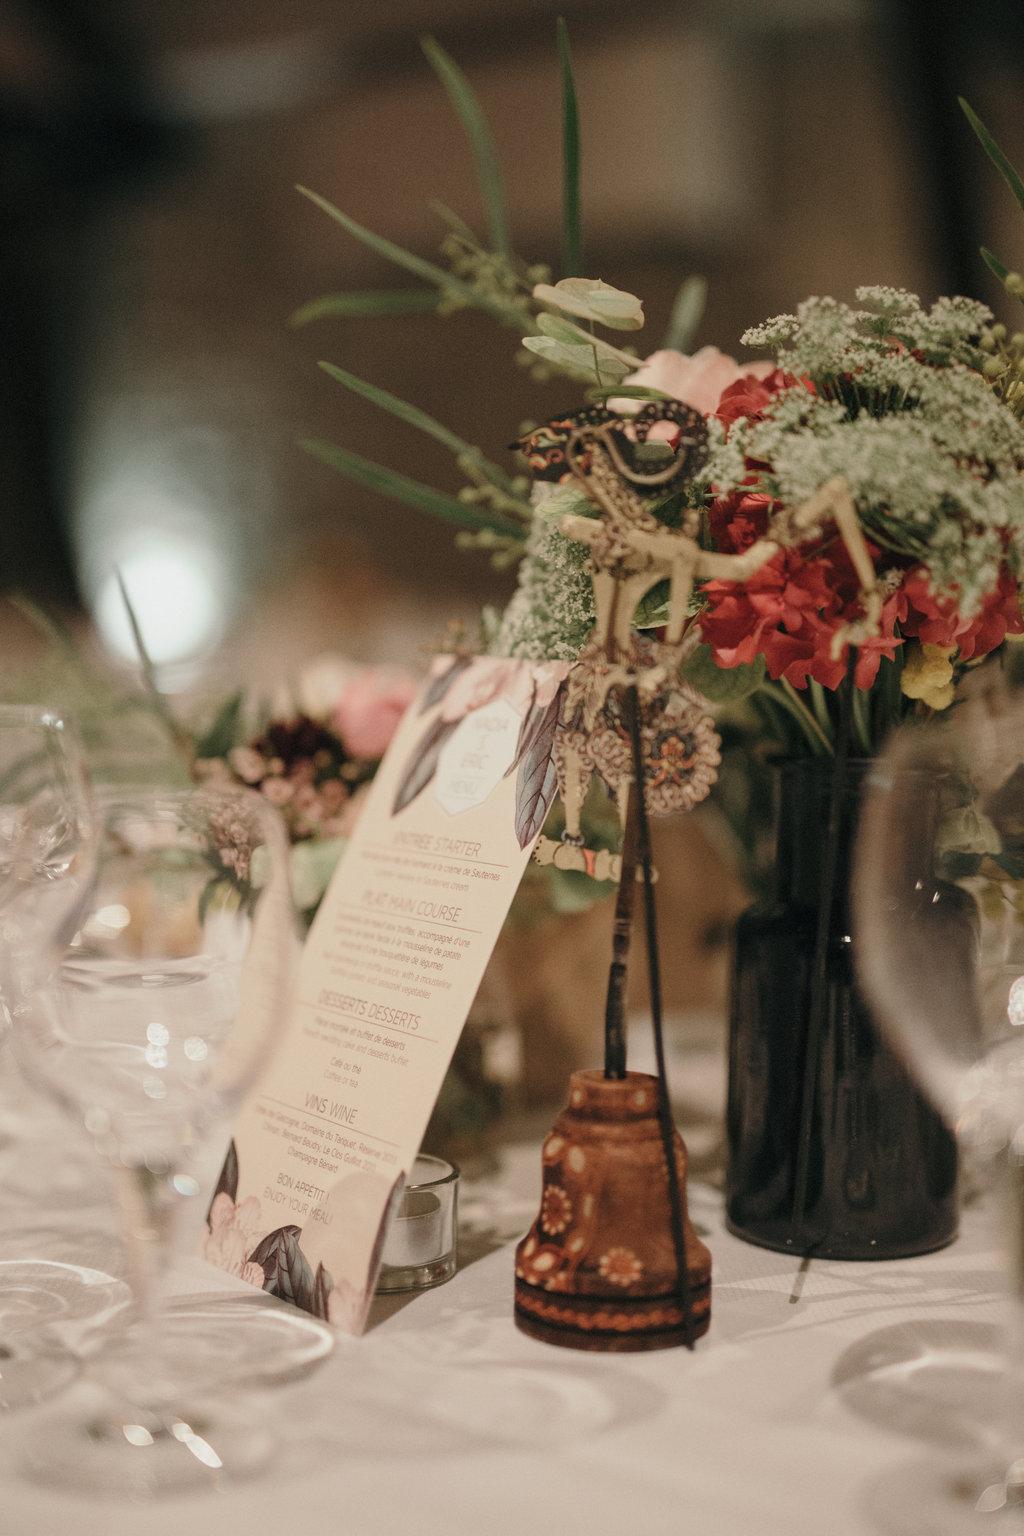 sebastienboudot-wedding-photographer-nadia-eric-432